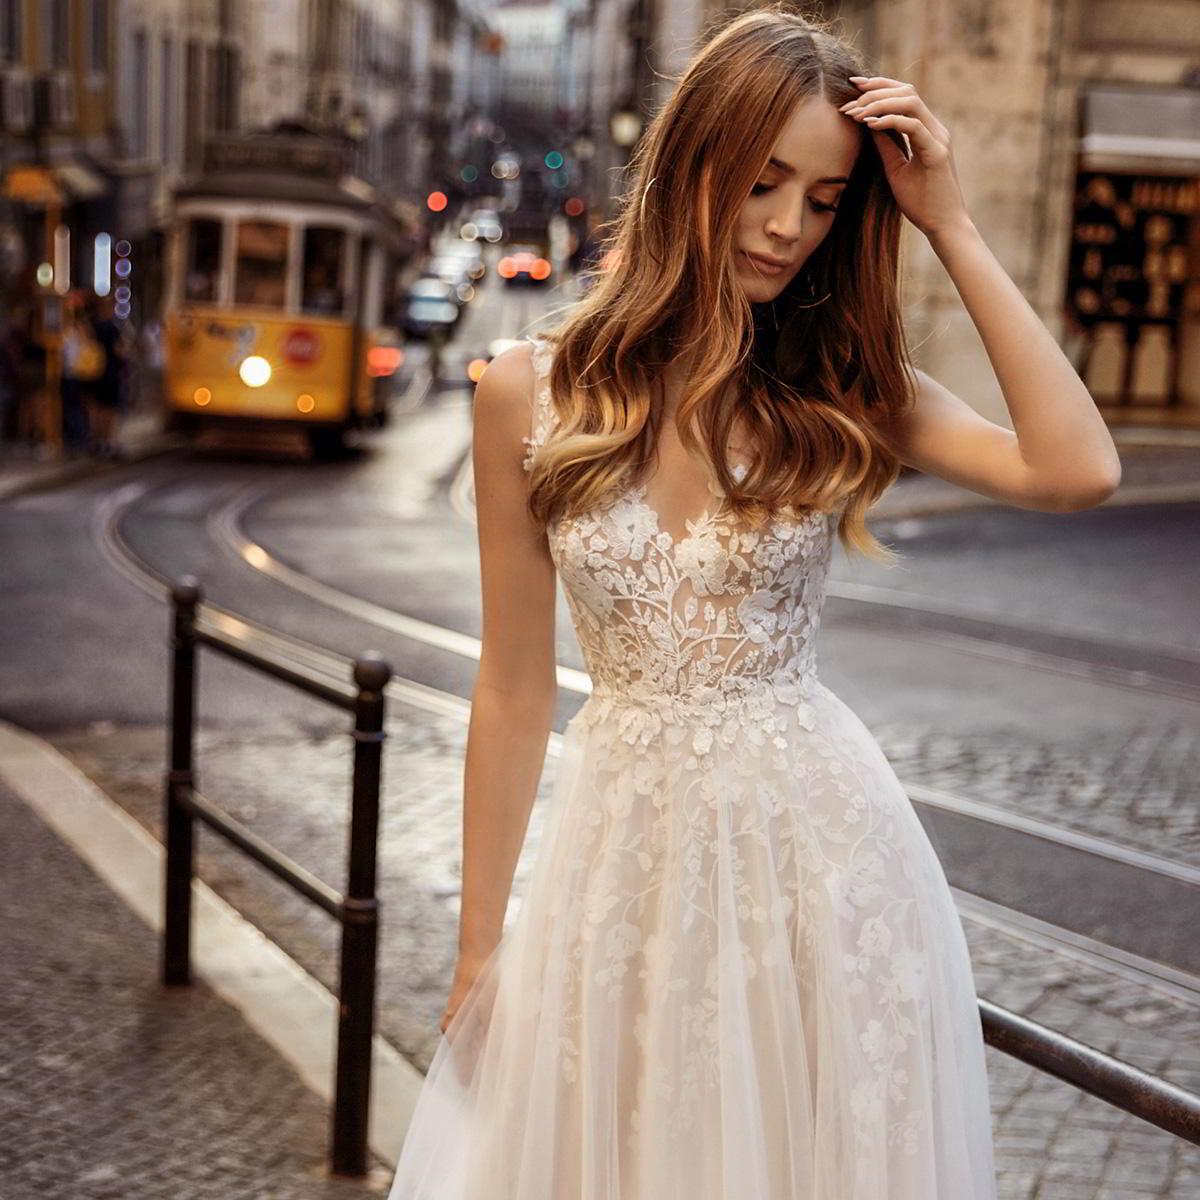 The Bridal Collection Real Bride: Tom Sebastien 2019 Wedding Dresses